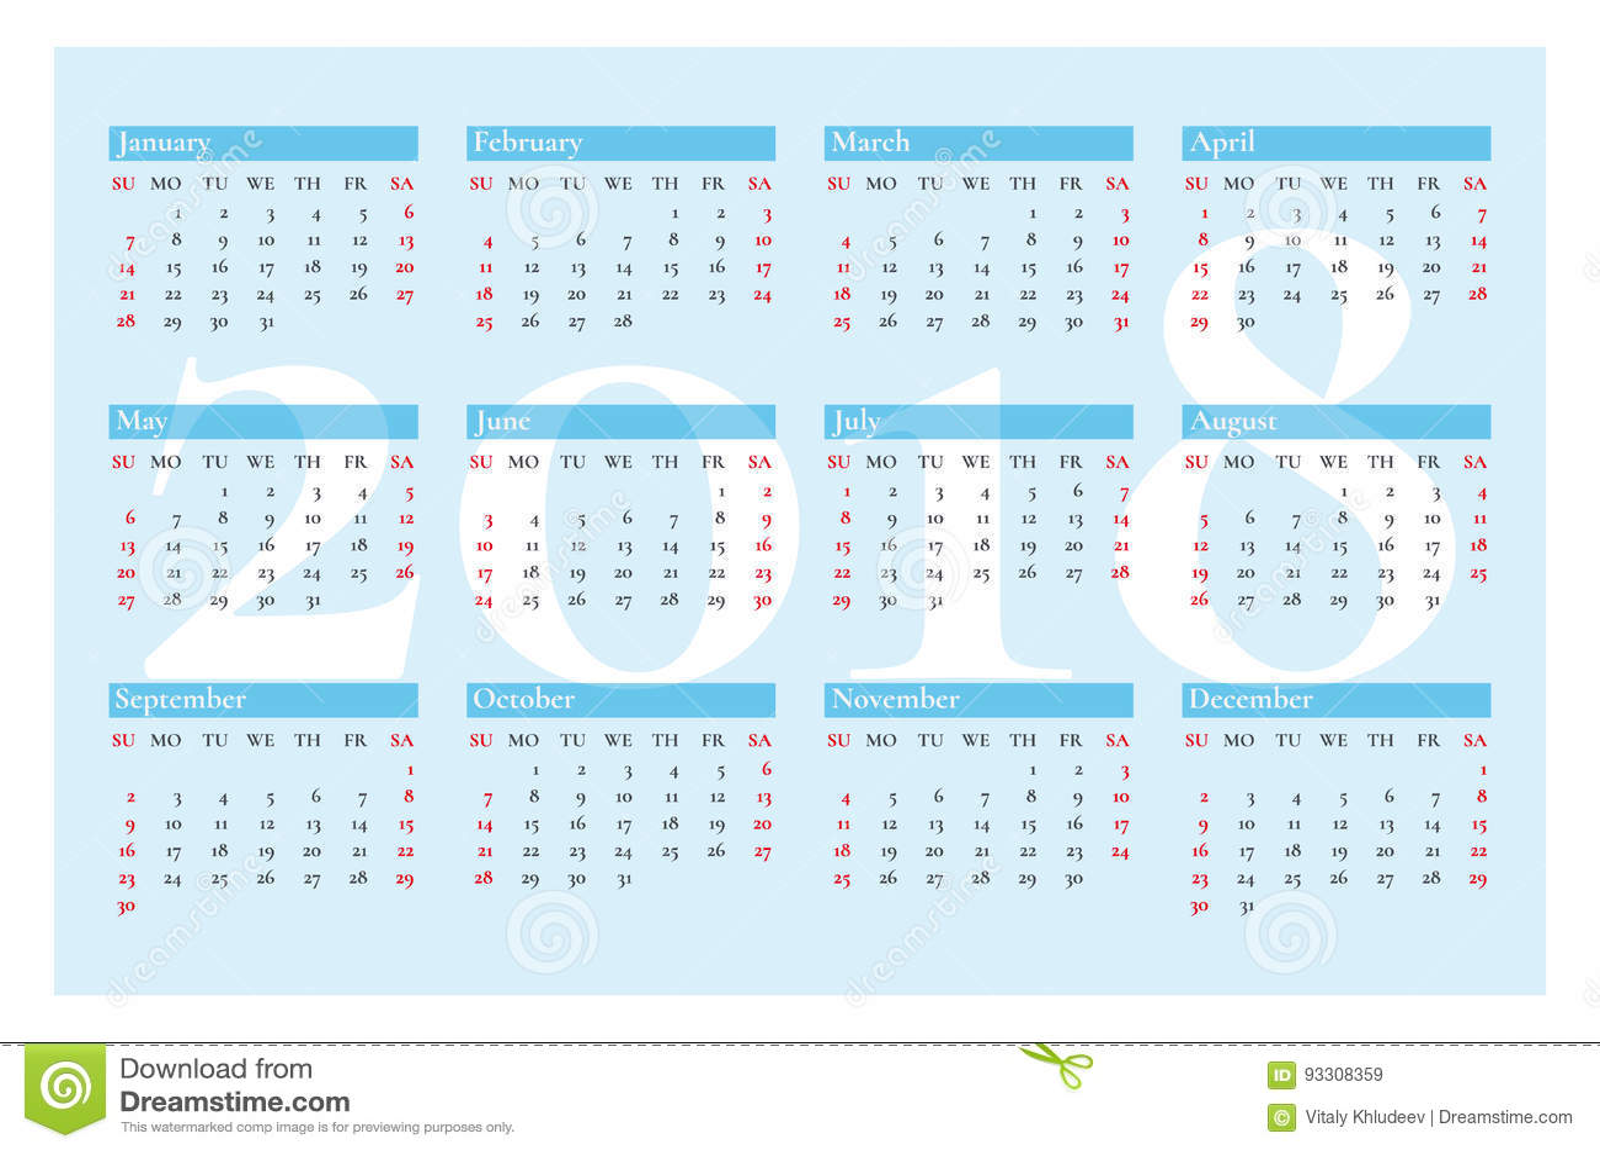 Calendario De Bolsillo Gratis Del Augetype Fct003